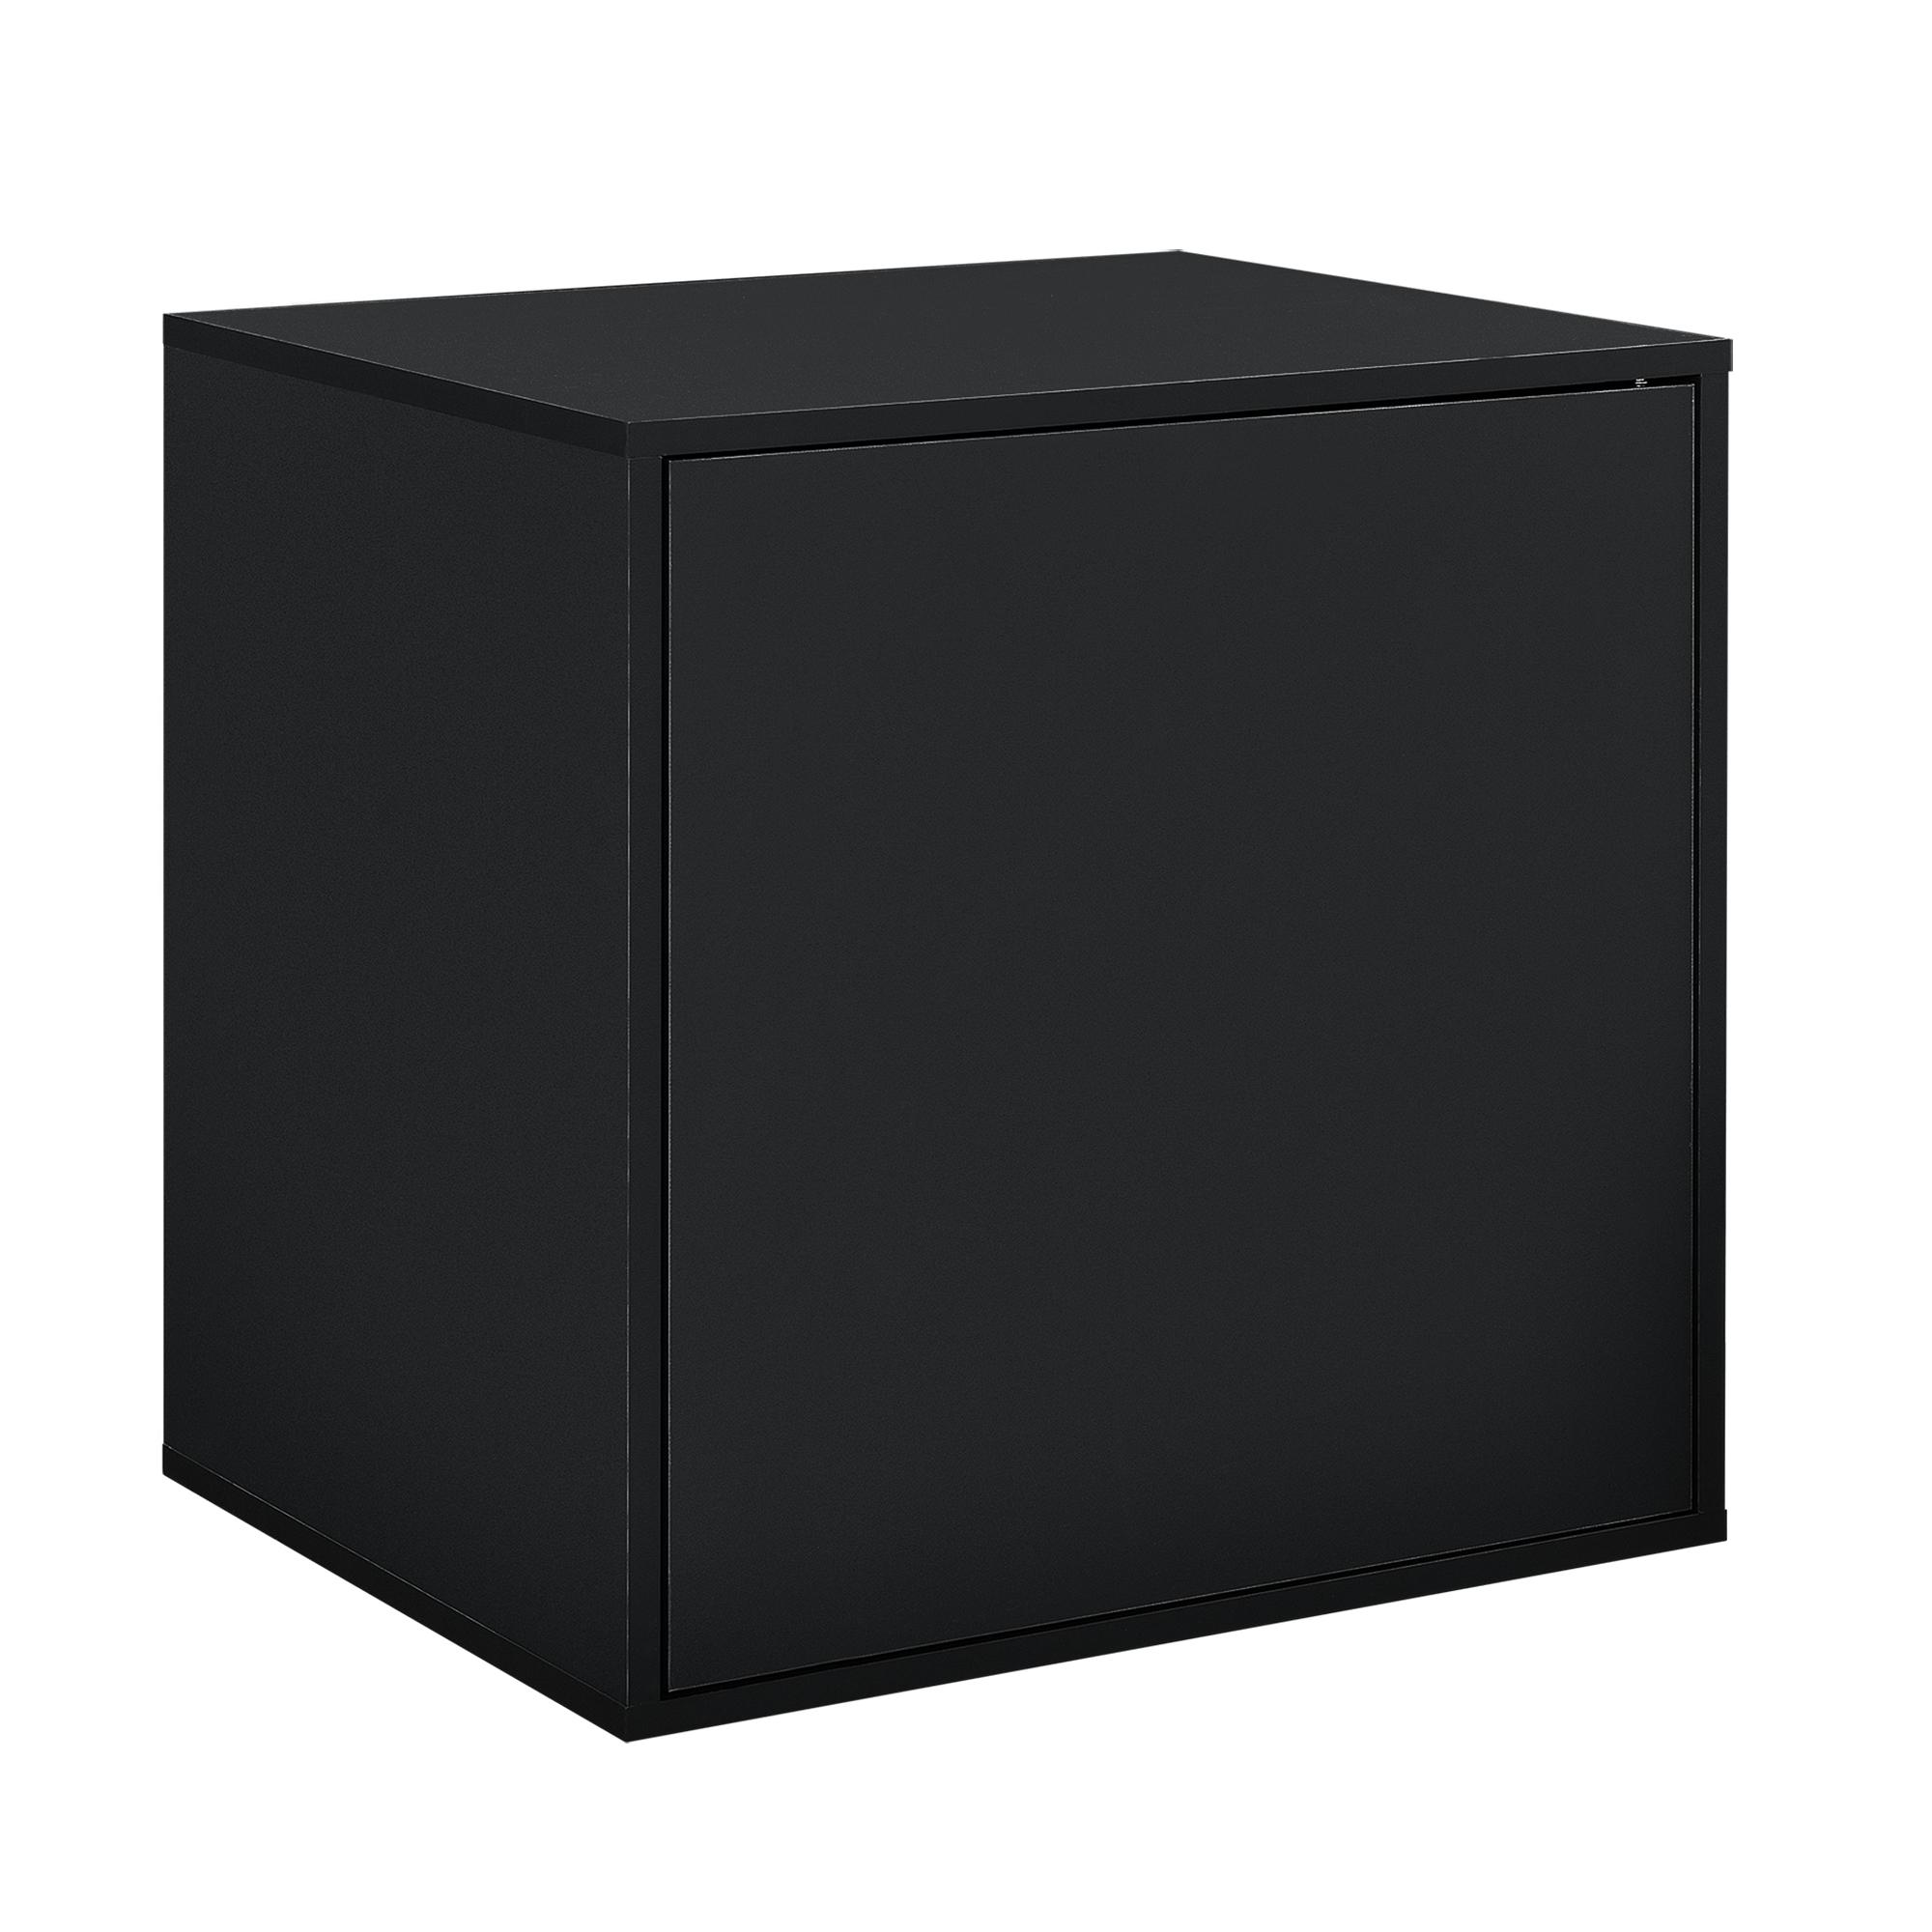 h ngeschrank 45x45x40cm schwarz wandschrank schrank wandregal regal ebay. Black Bedroom Furniture Sets. Home Design Ideas